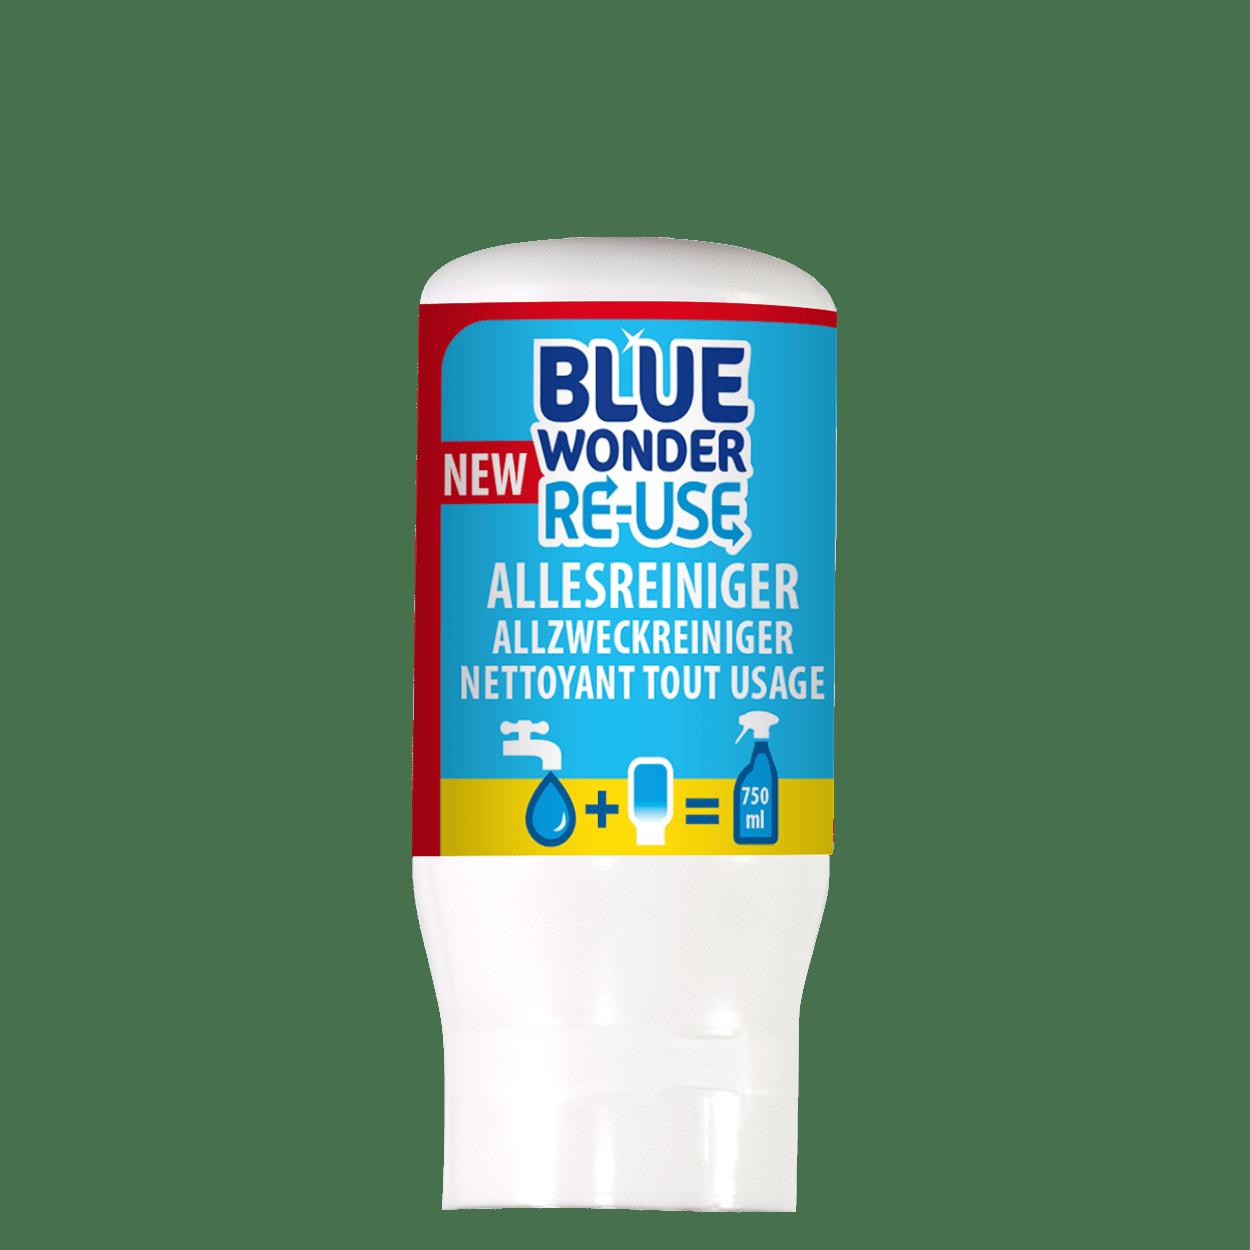 8712038001950 Blue Wonder Allesreiniger_refill capsule_102020